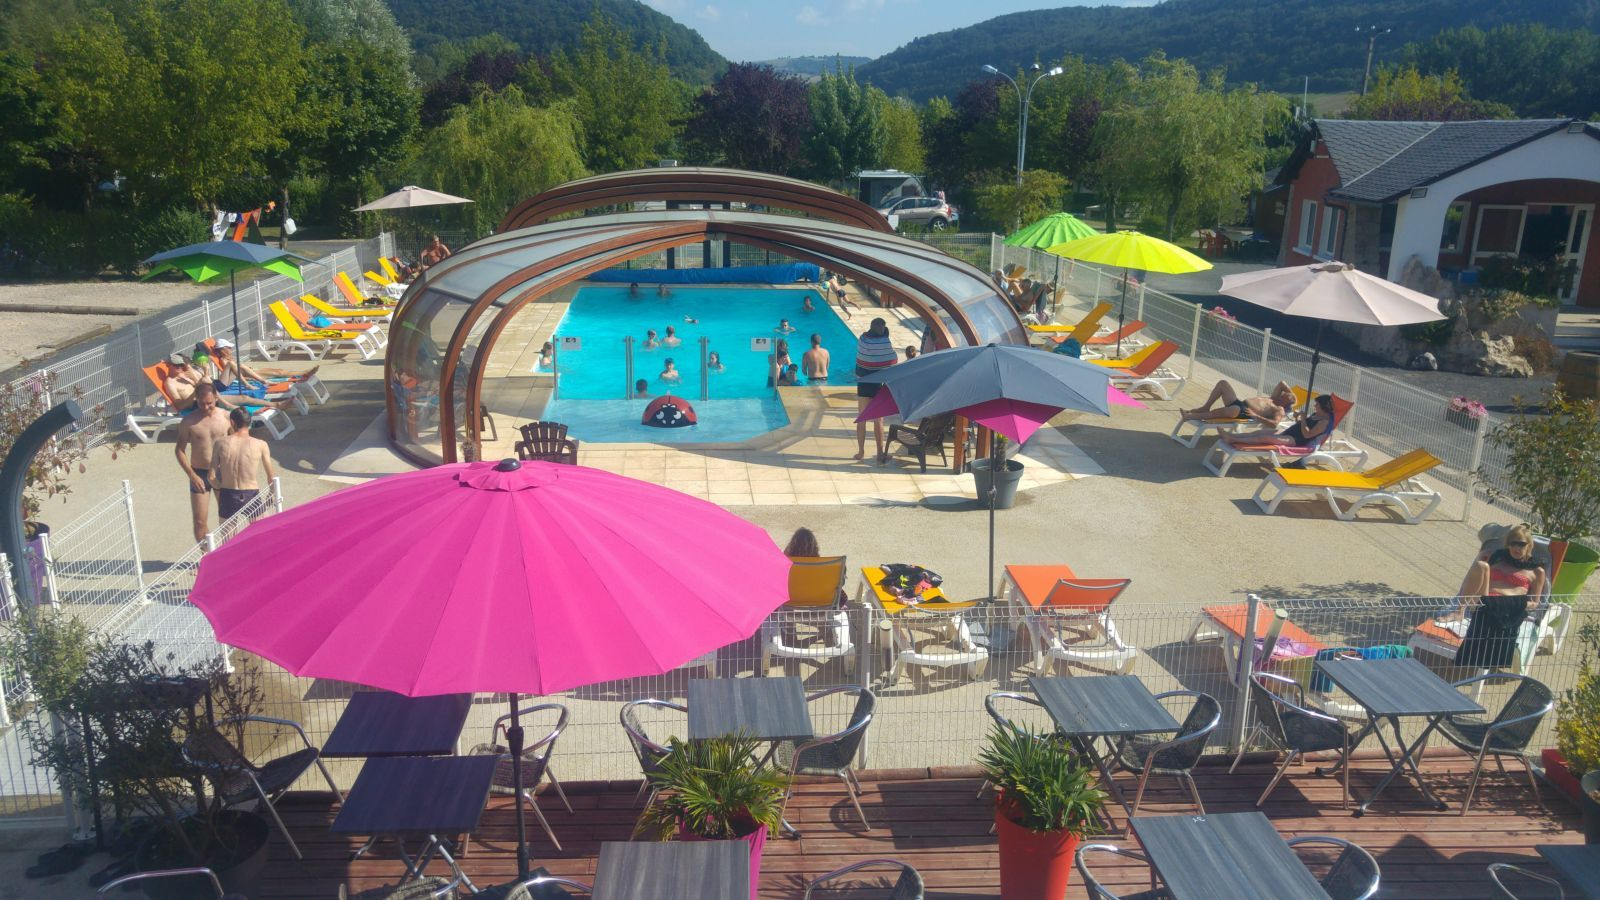 Camping Aveyron | Gorges Du Tarn | 4 Étoiles | Camping Entre ... pour Camping Gorges Du Tarn Avec Piscine